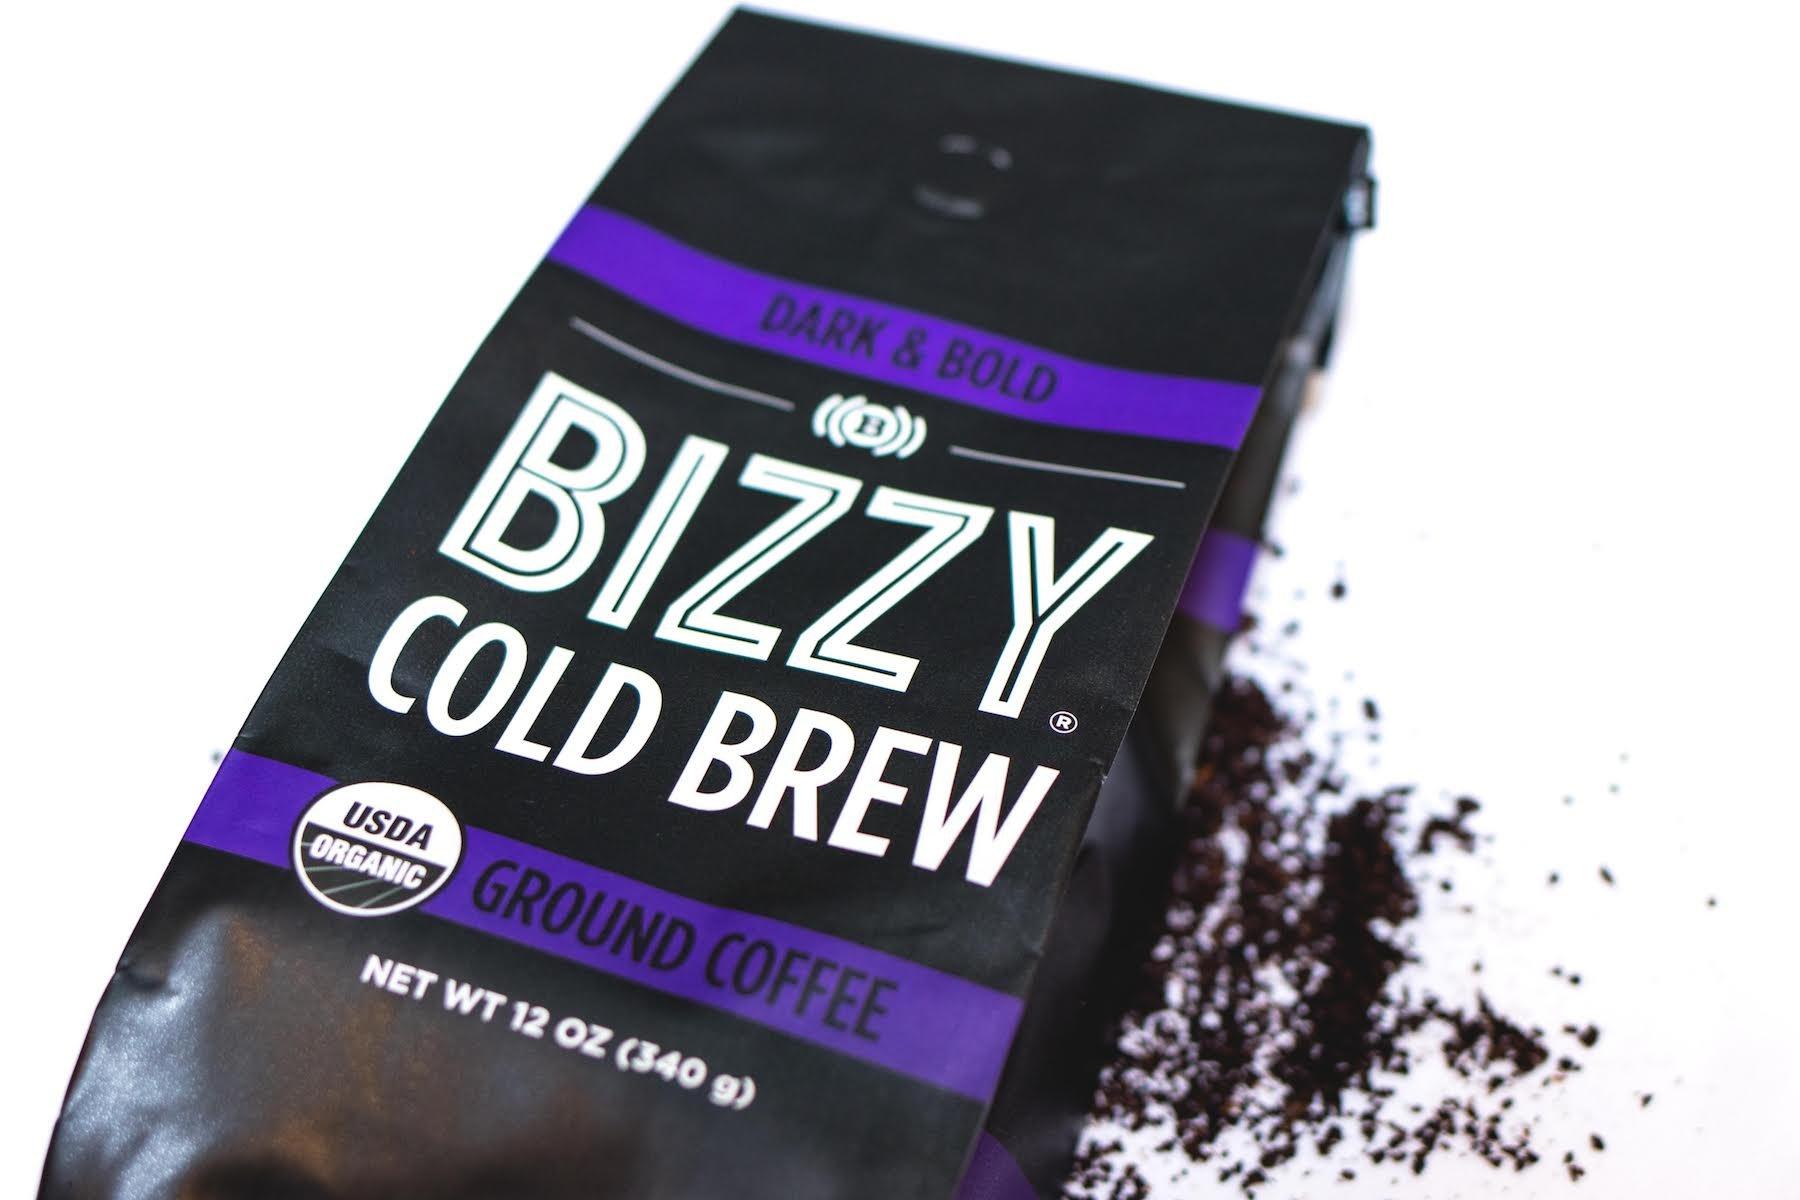 Bizzy Organic Cold Brew Coffee - Dark & Bold Blend - Coarse Ground Coffee - 12 oz by Bizzy (Image #4)